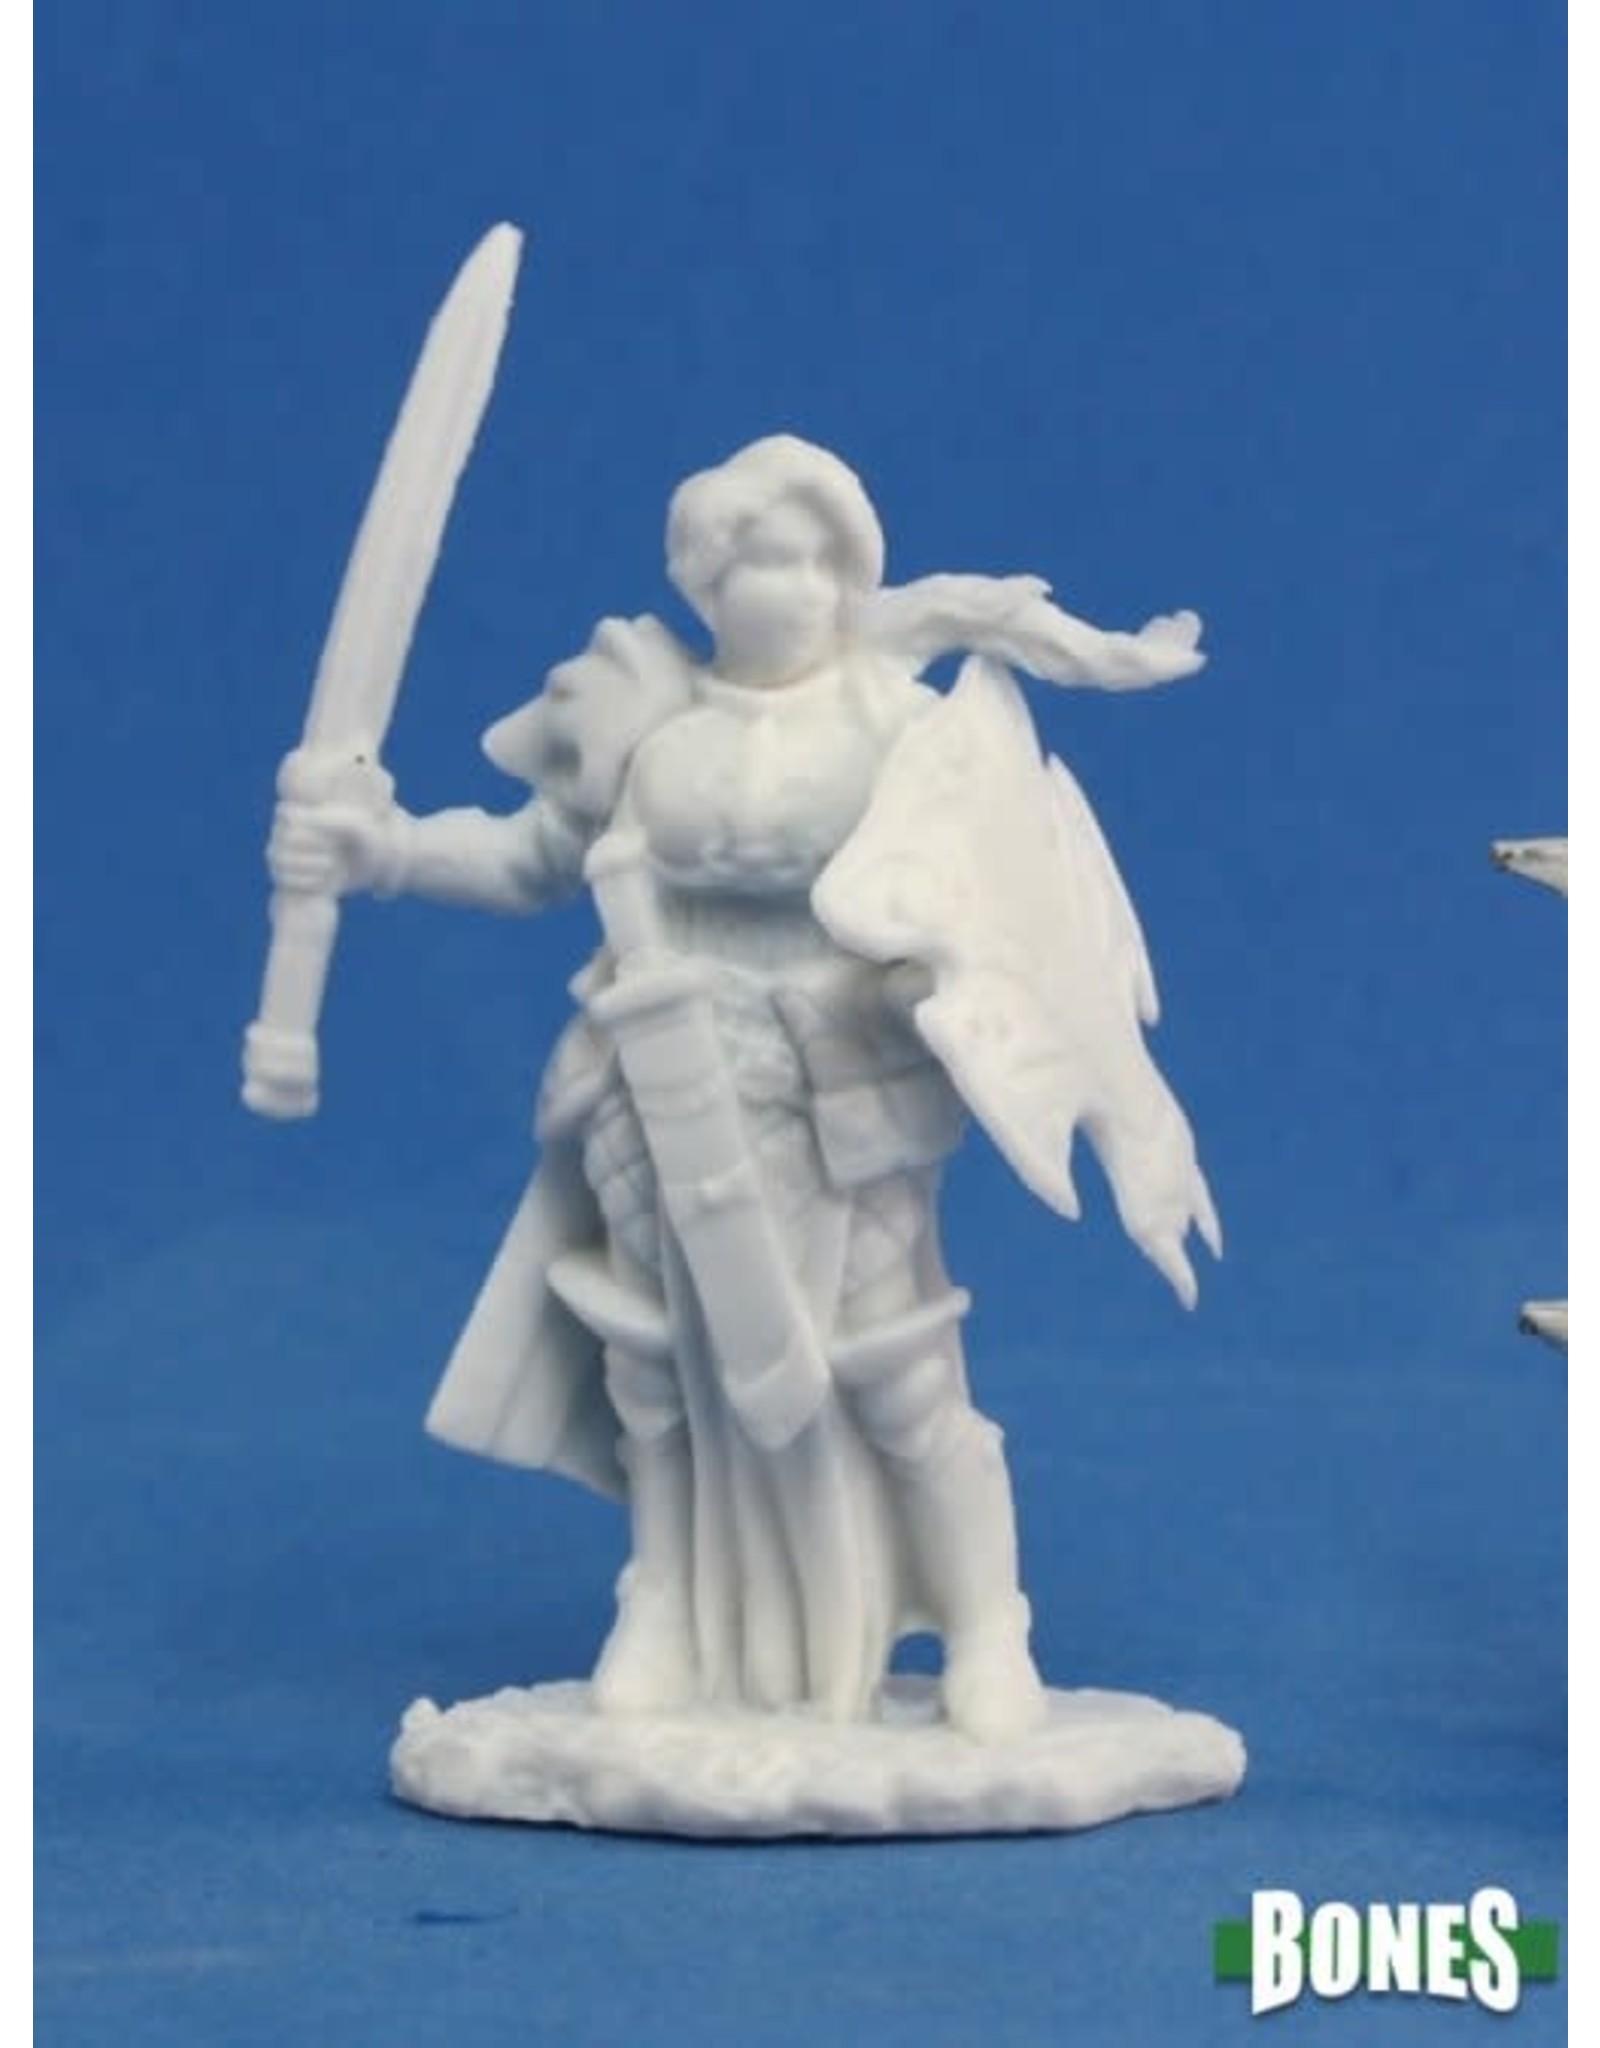 Reaper Miniatures Bones: Trista, Female Warrior